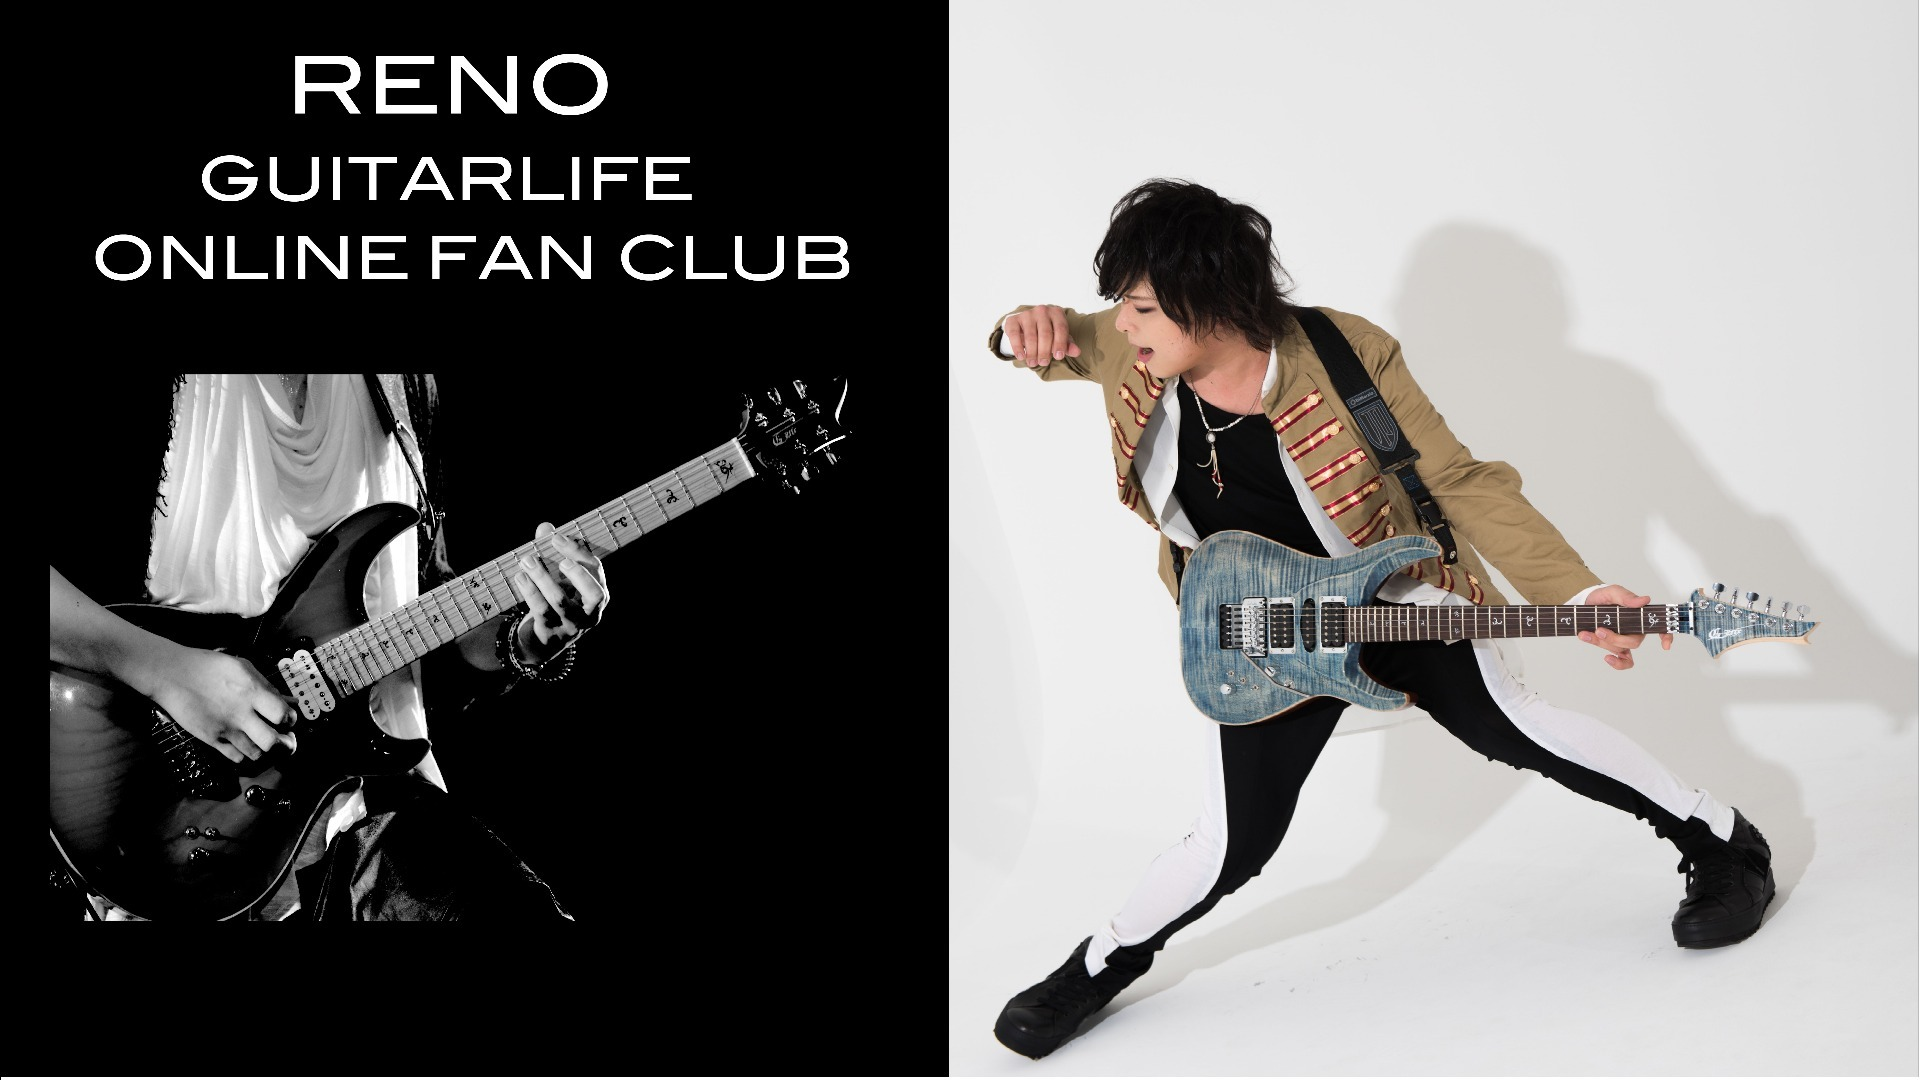 RENO  GUITARLIFE ONLINE FAN CLUB